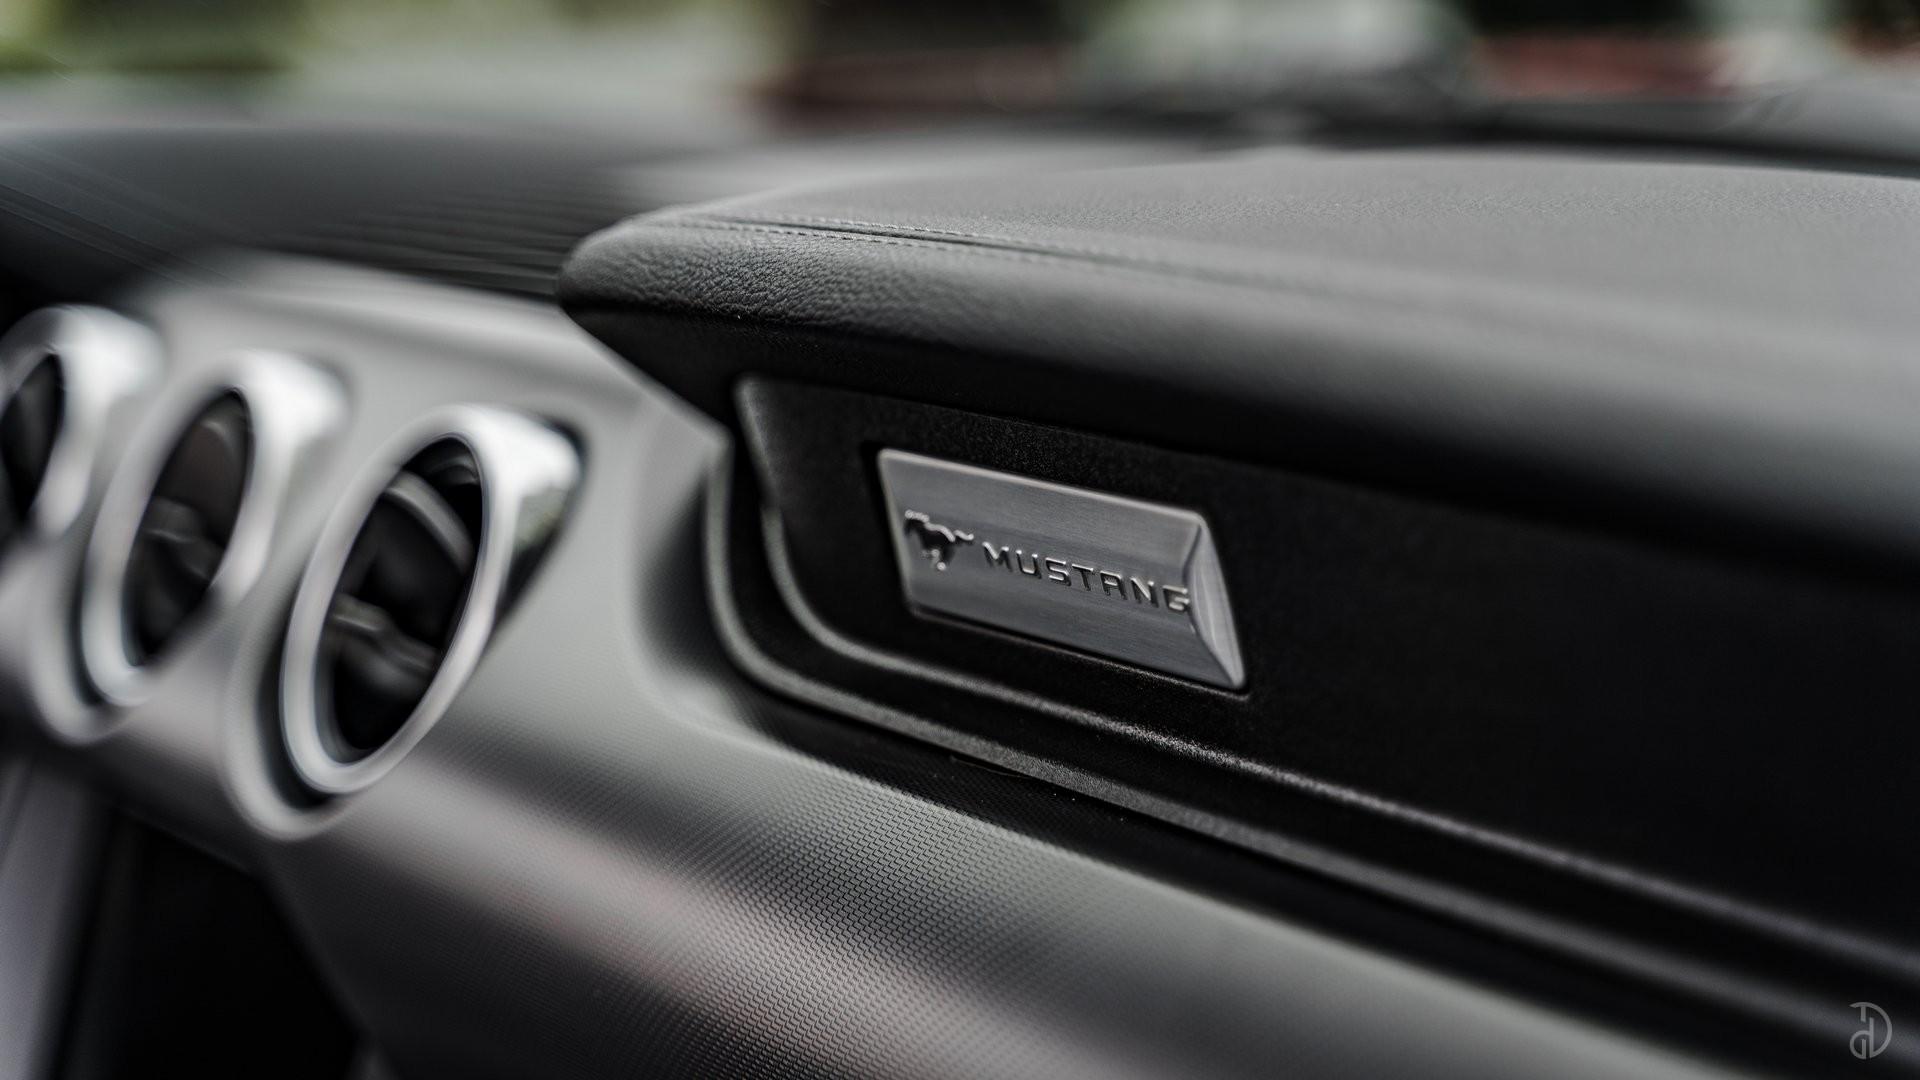 Аренда Ford Mustang GT 5.0 в Сочи. Фото 10